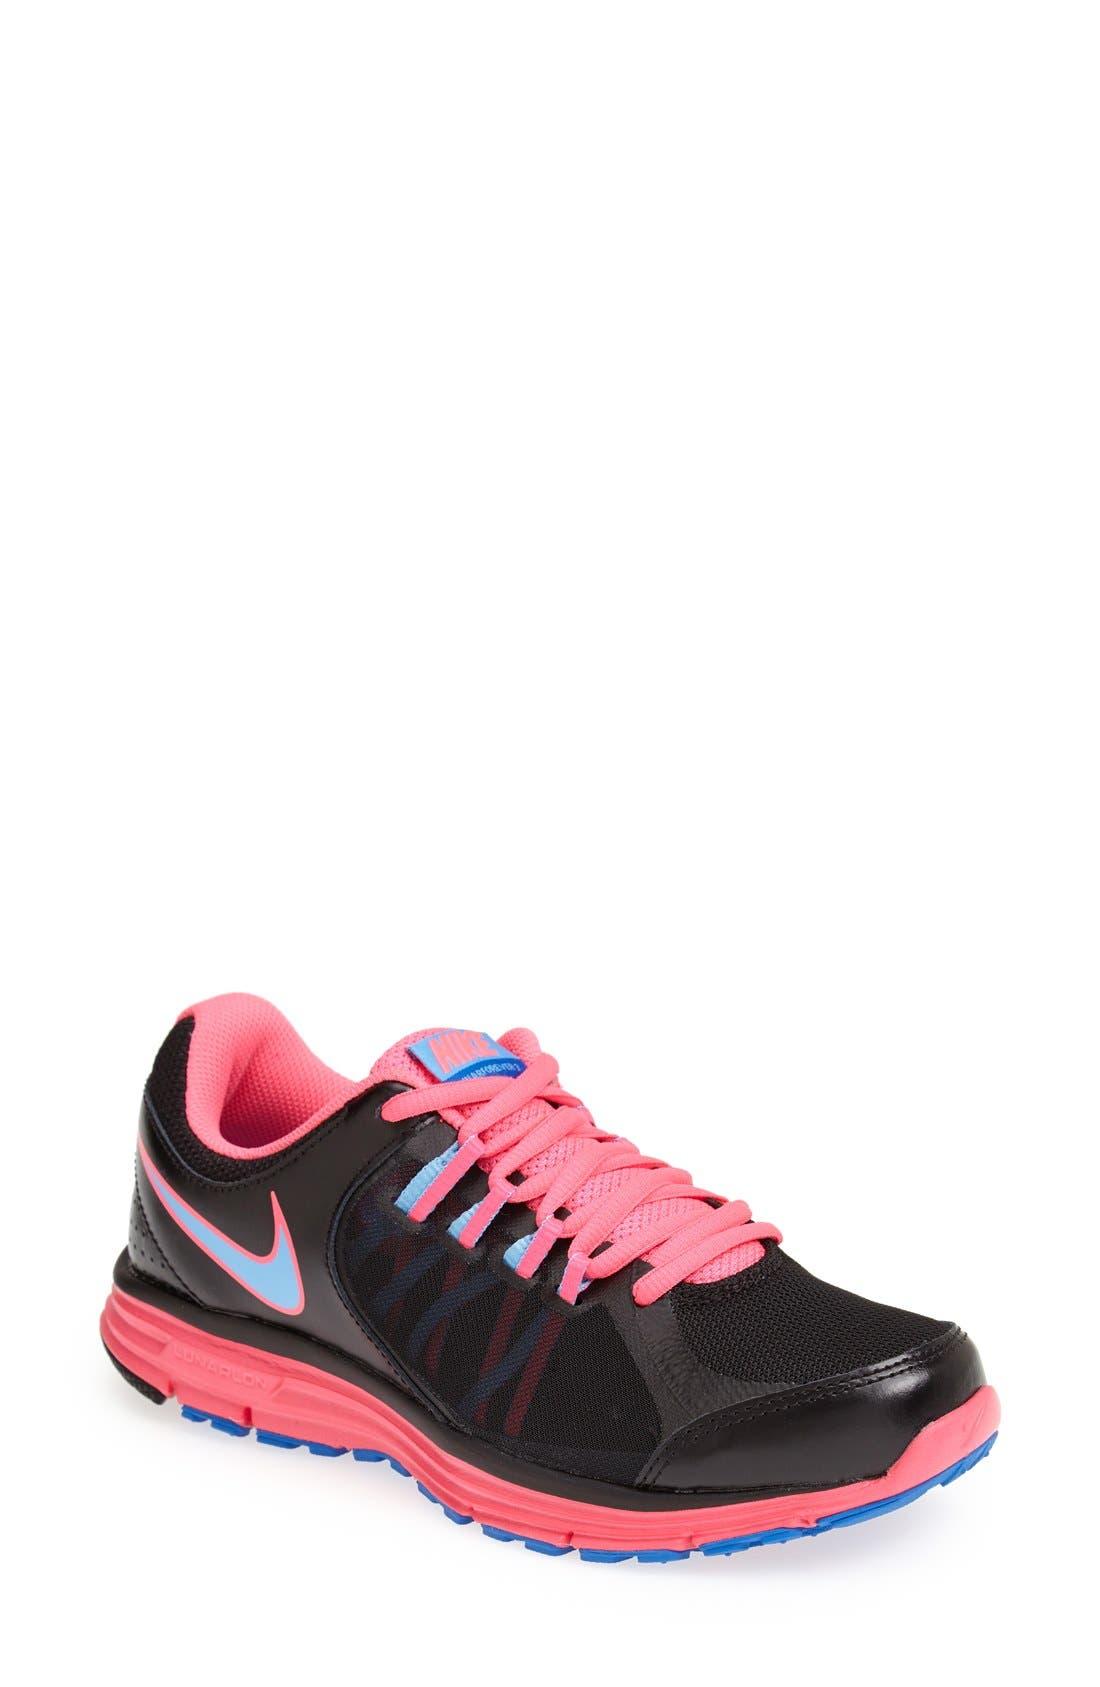 Main Image - Nike 'Lunar Forever 3' Running Shoe (Women)